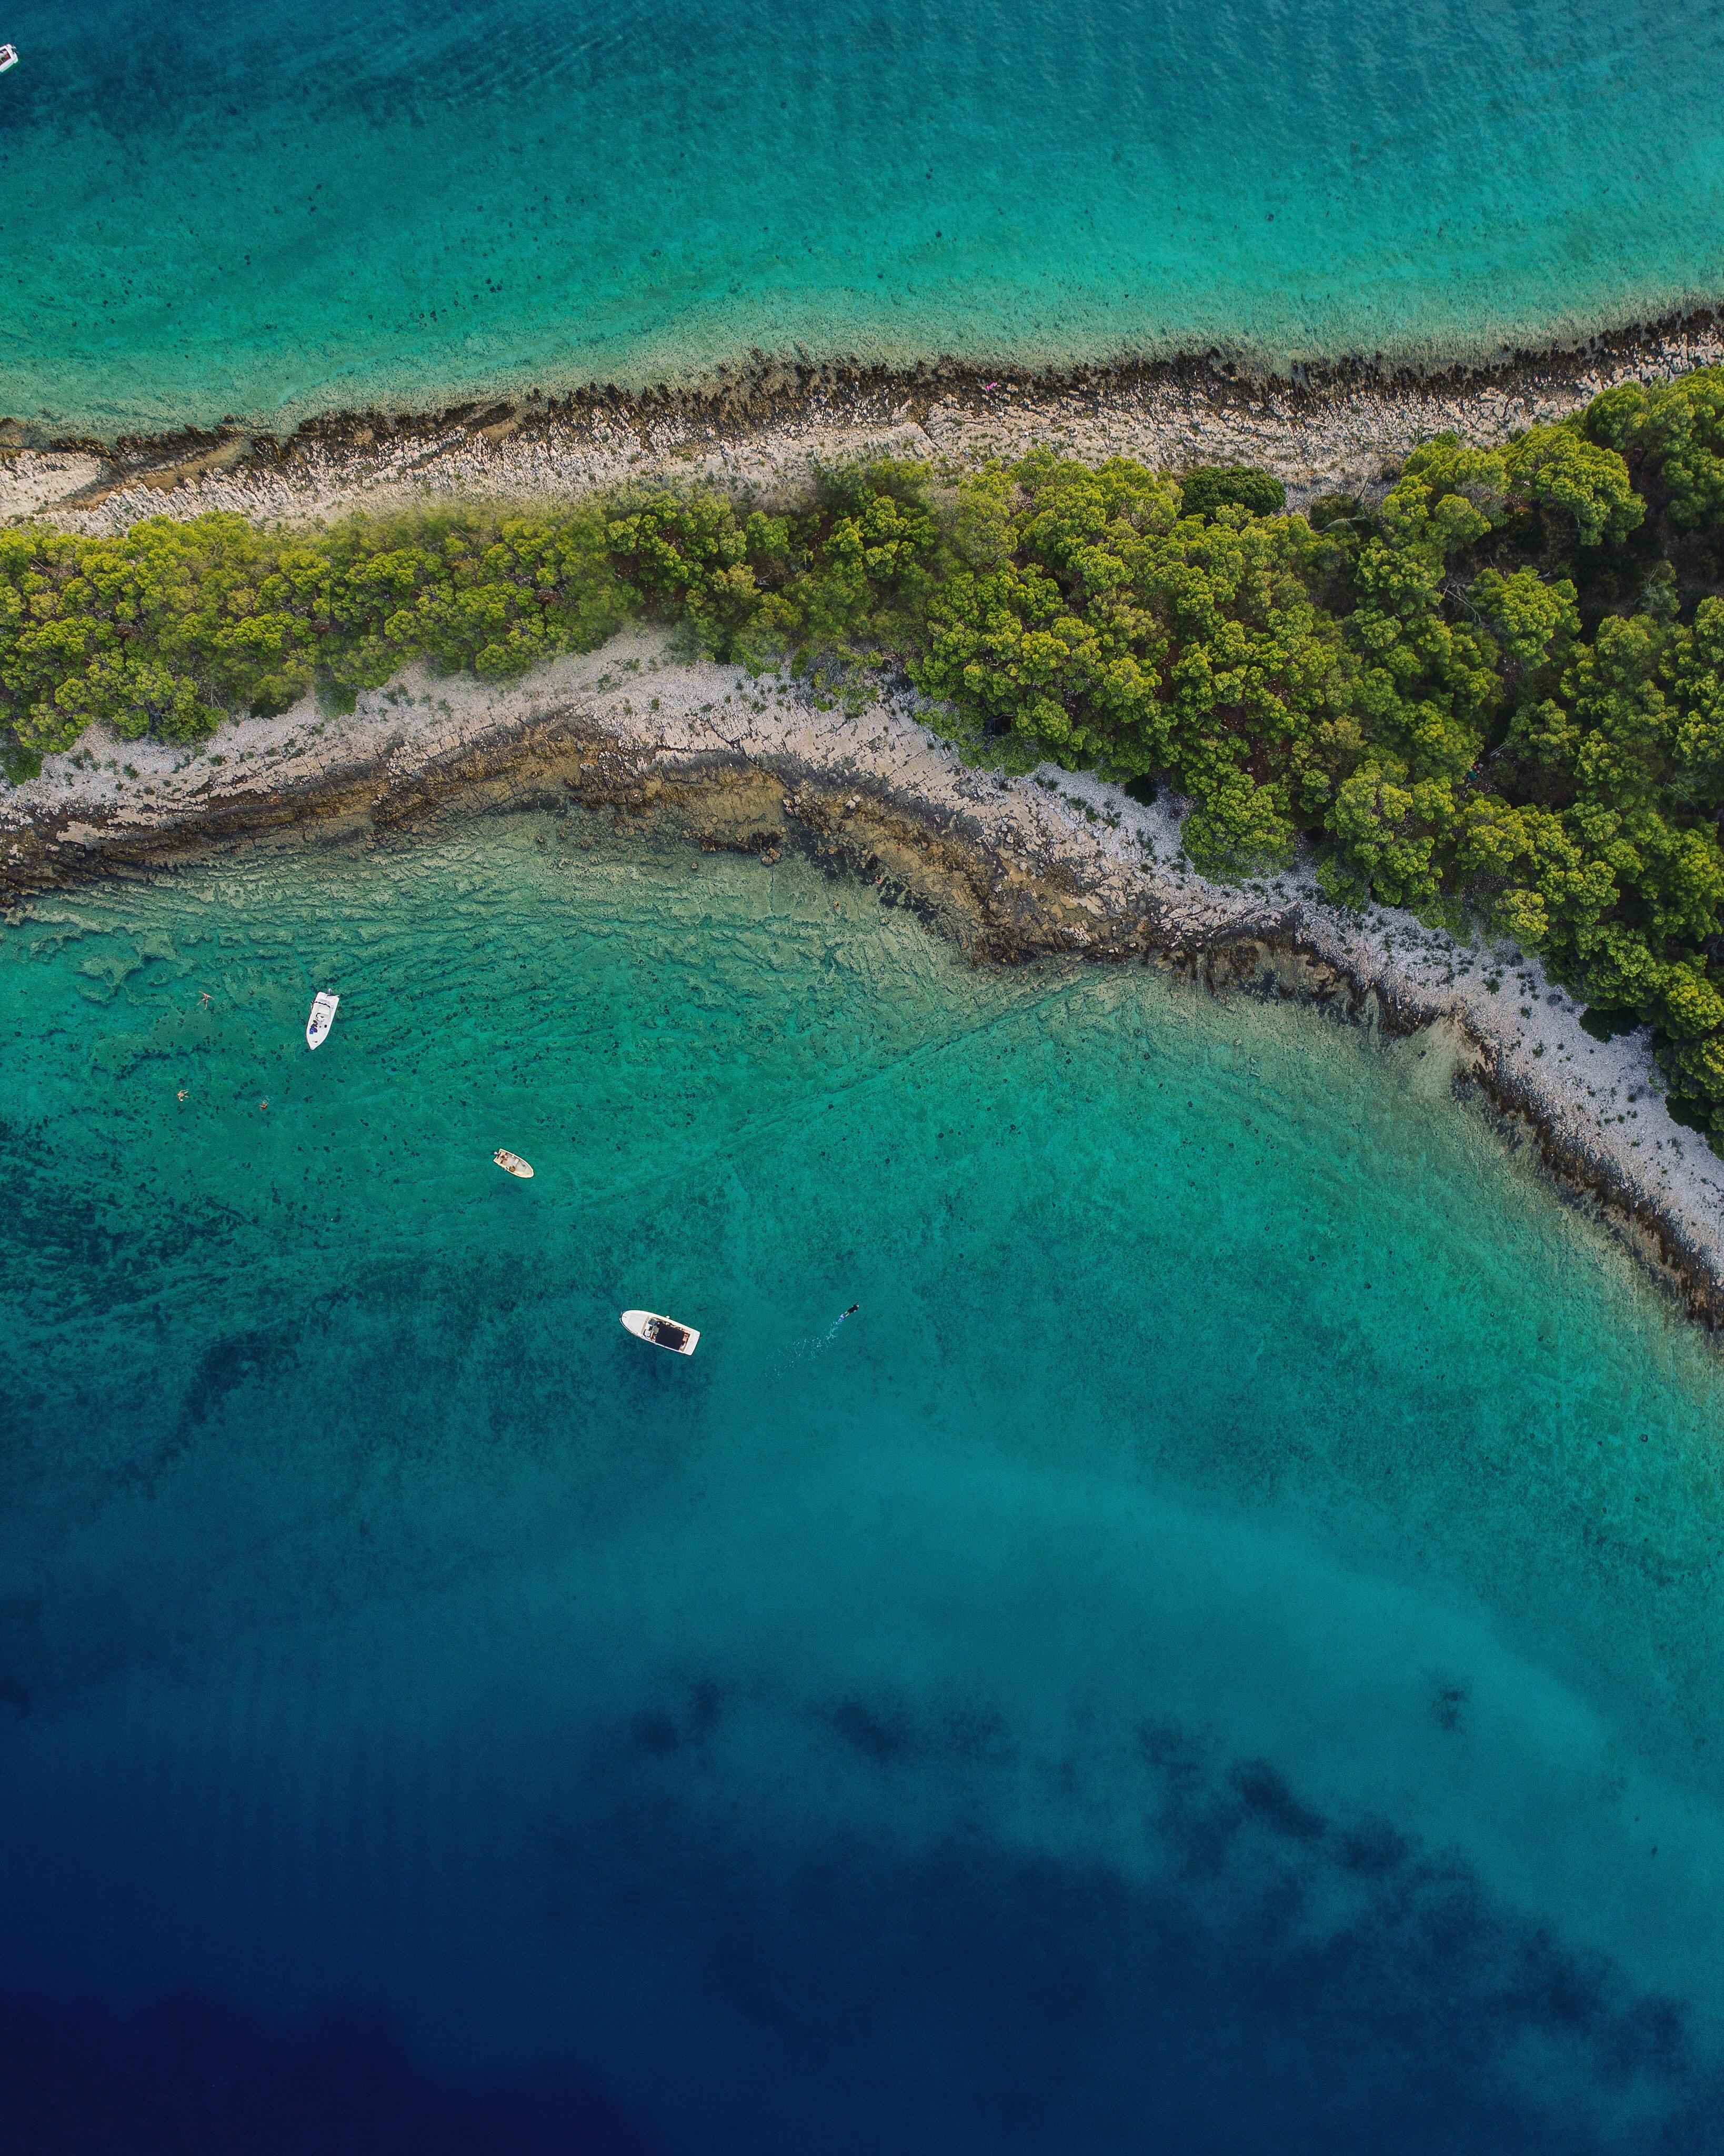 143995 Заставки и Обои Лодки на телефон. Скачать Природа, Море, Остров, Вид Сверху, Лодки, Пляж картинки бесплатно